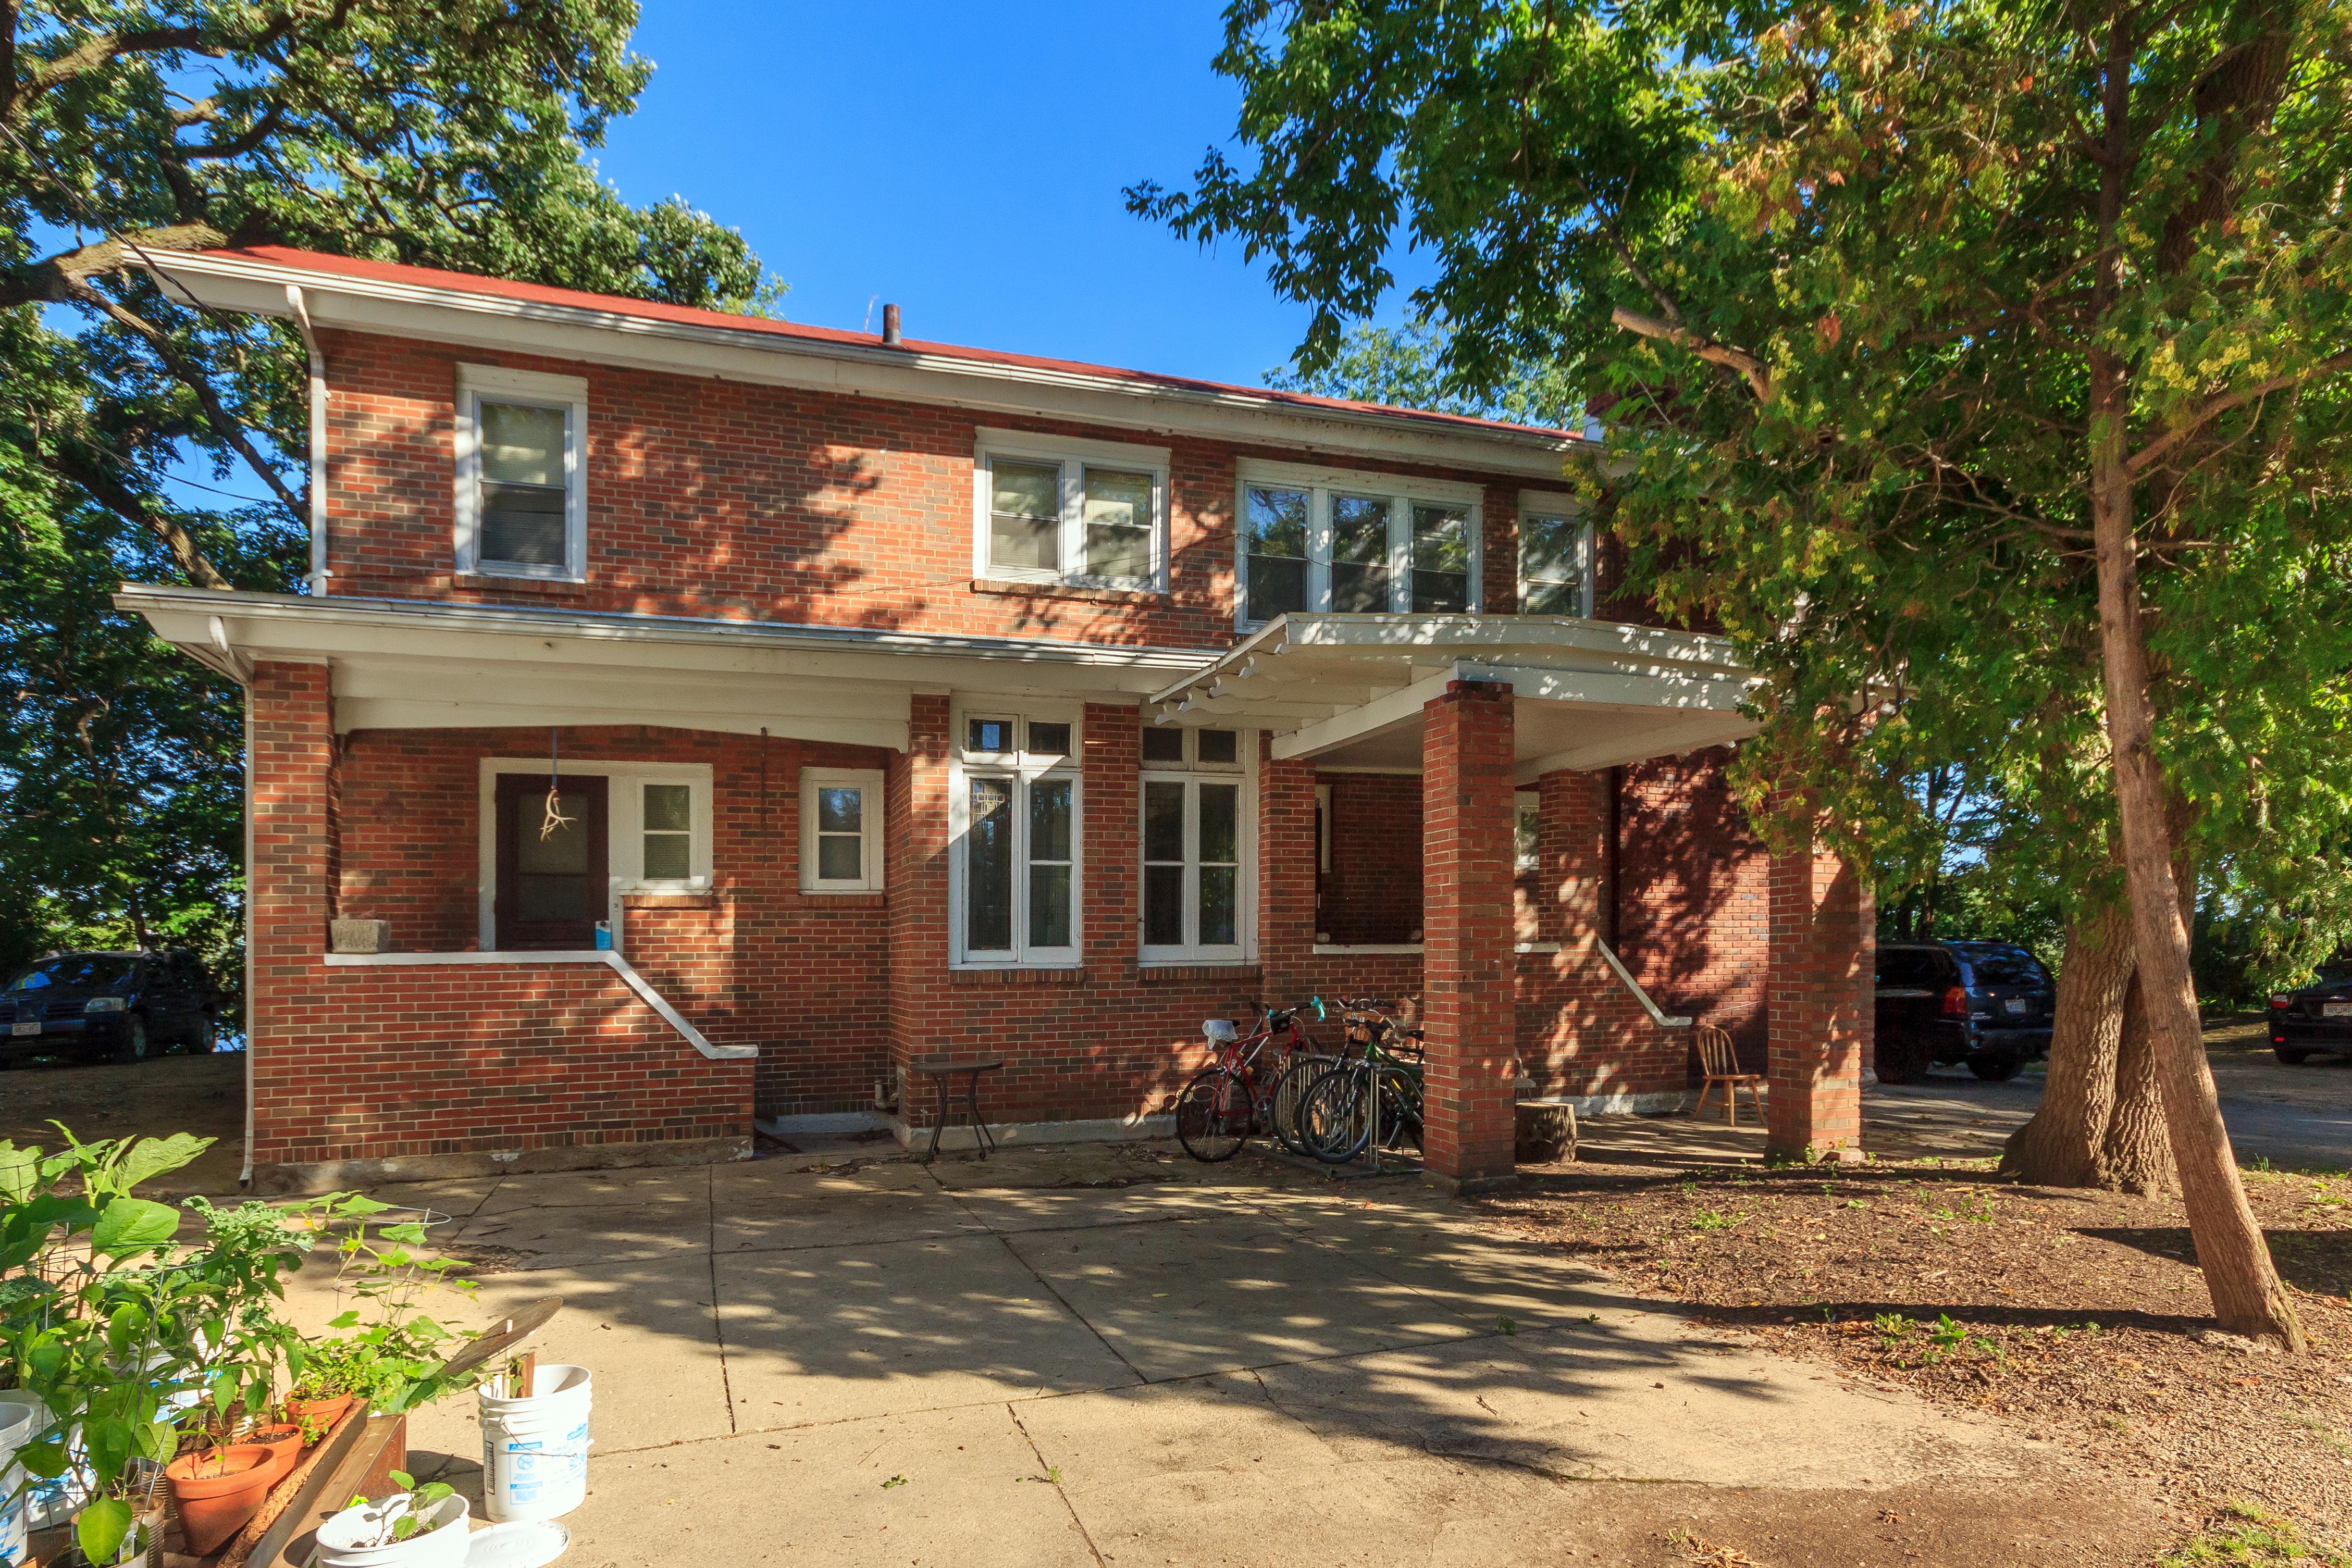 Housing Near University of Wisconsin 425 W Wilson St